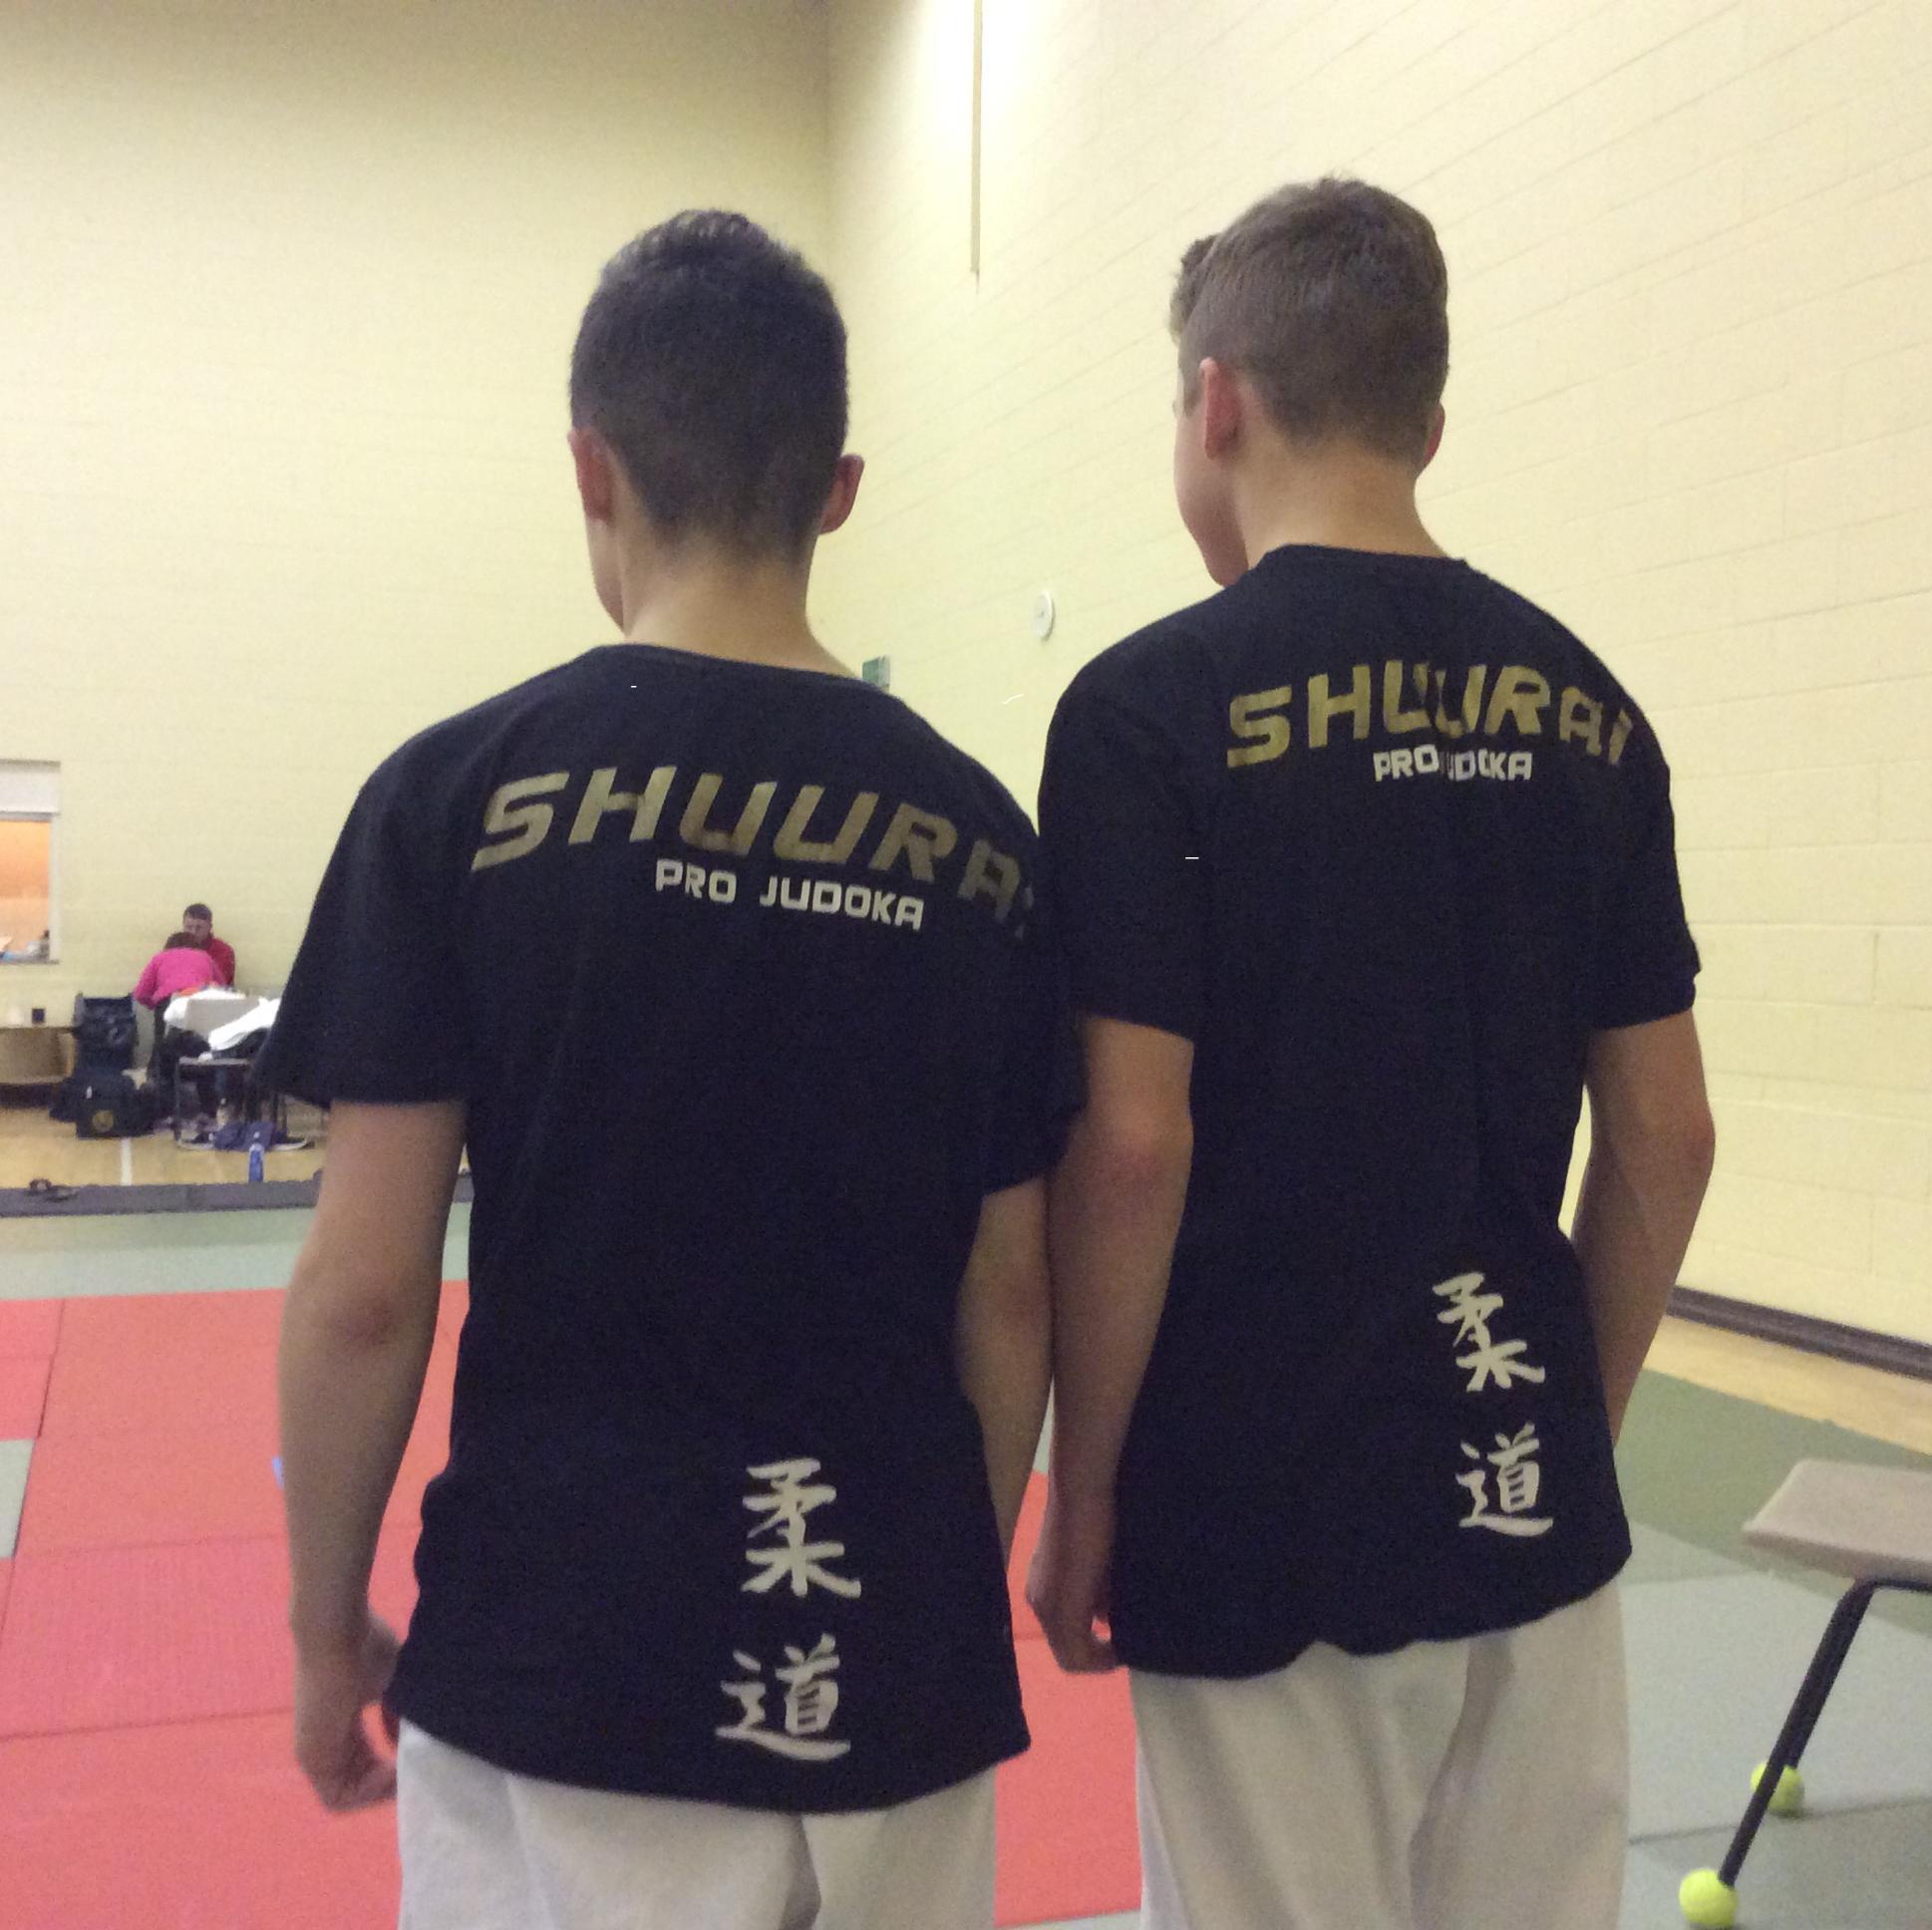 Ted Bowerman Ted Bowerman judoka215 Twitter